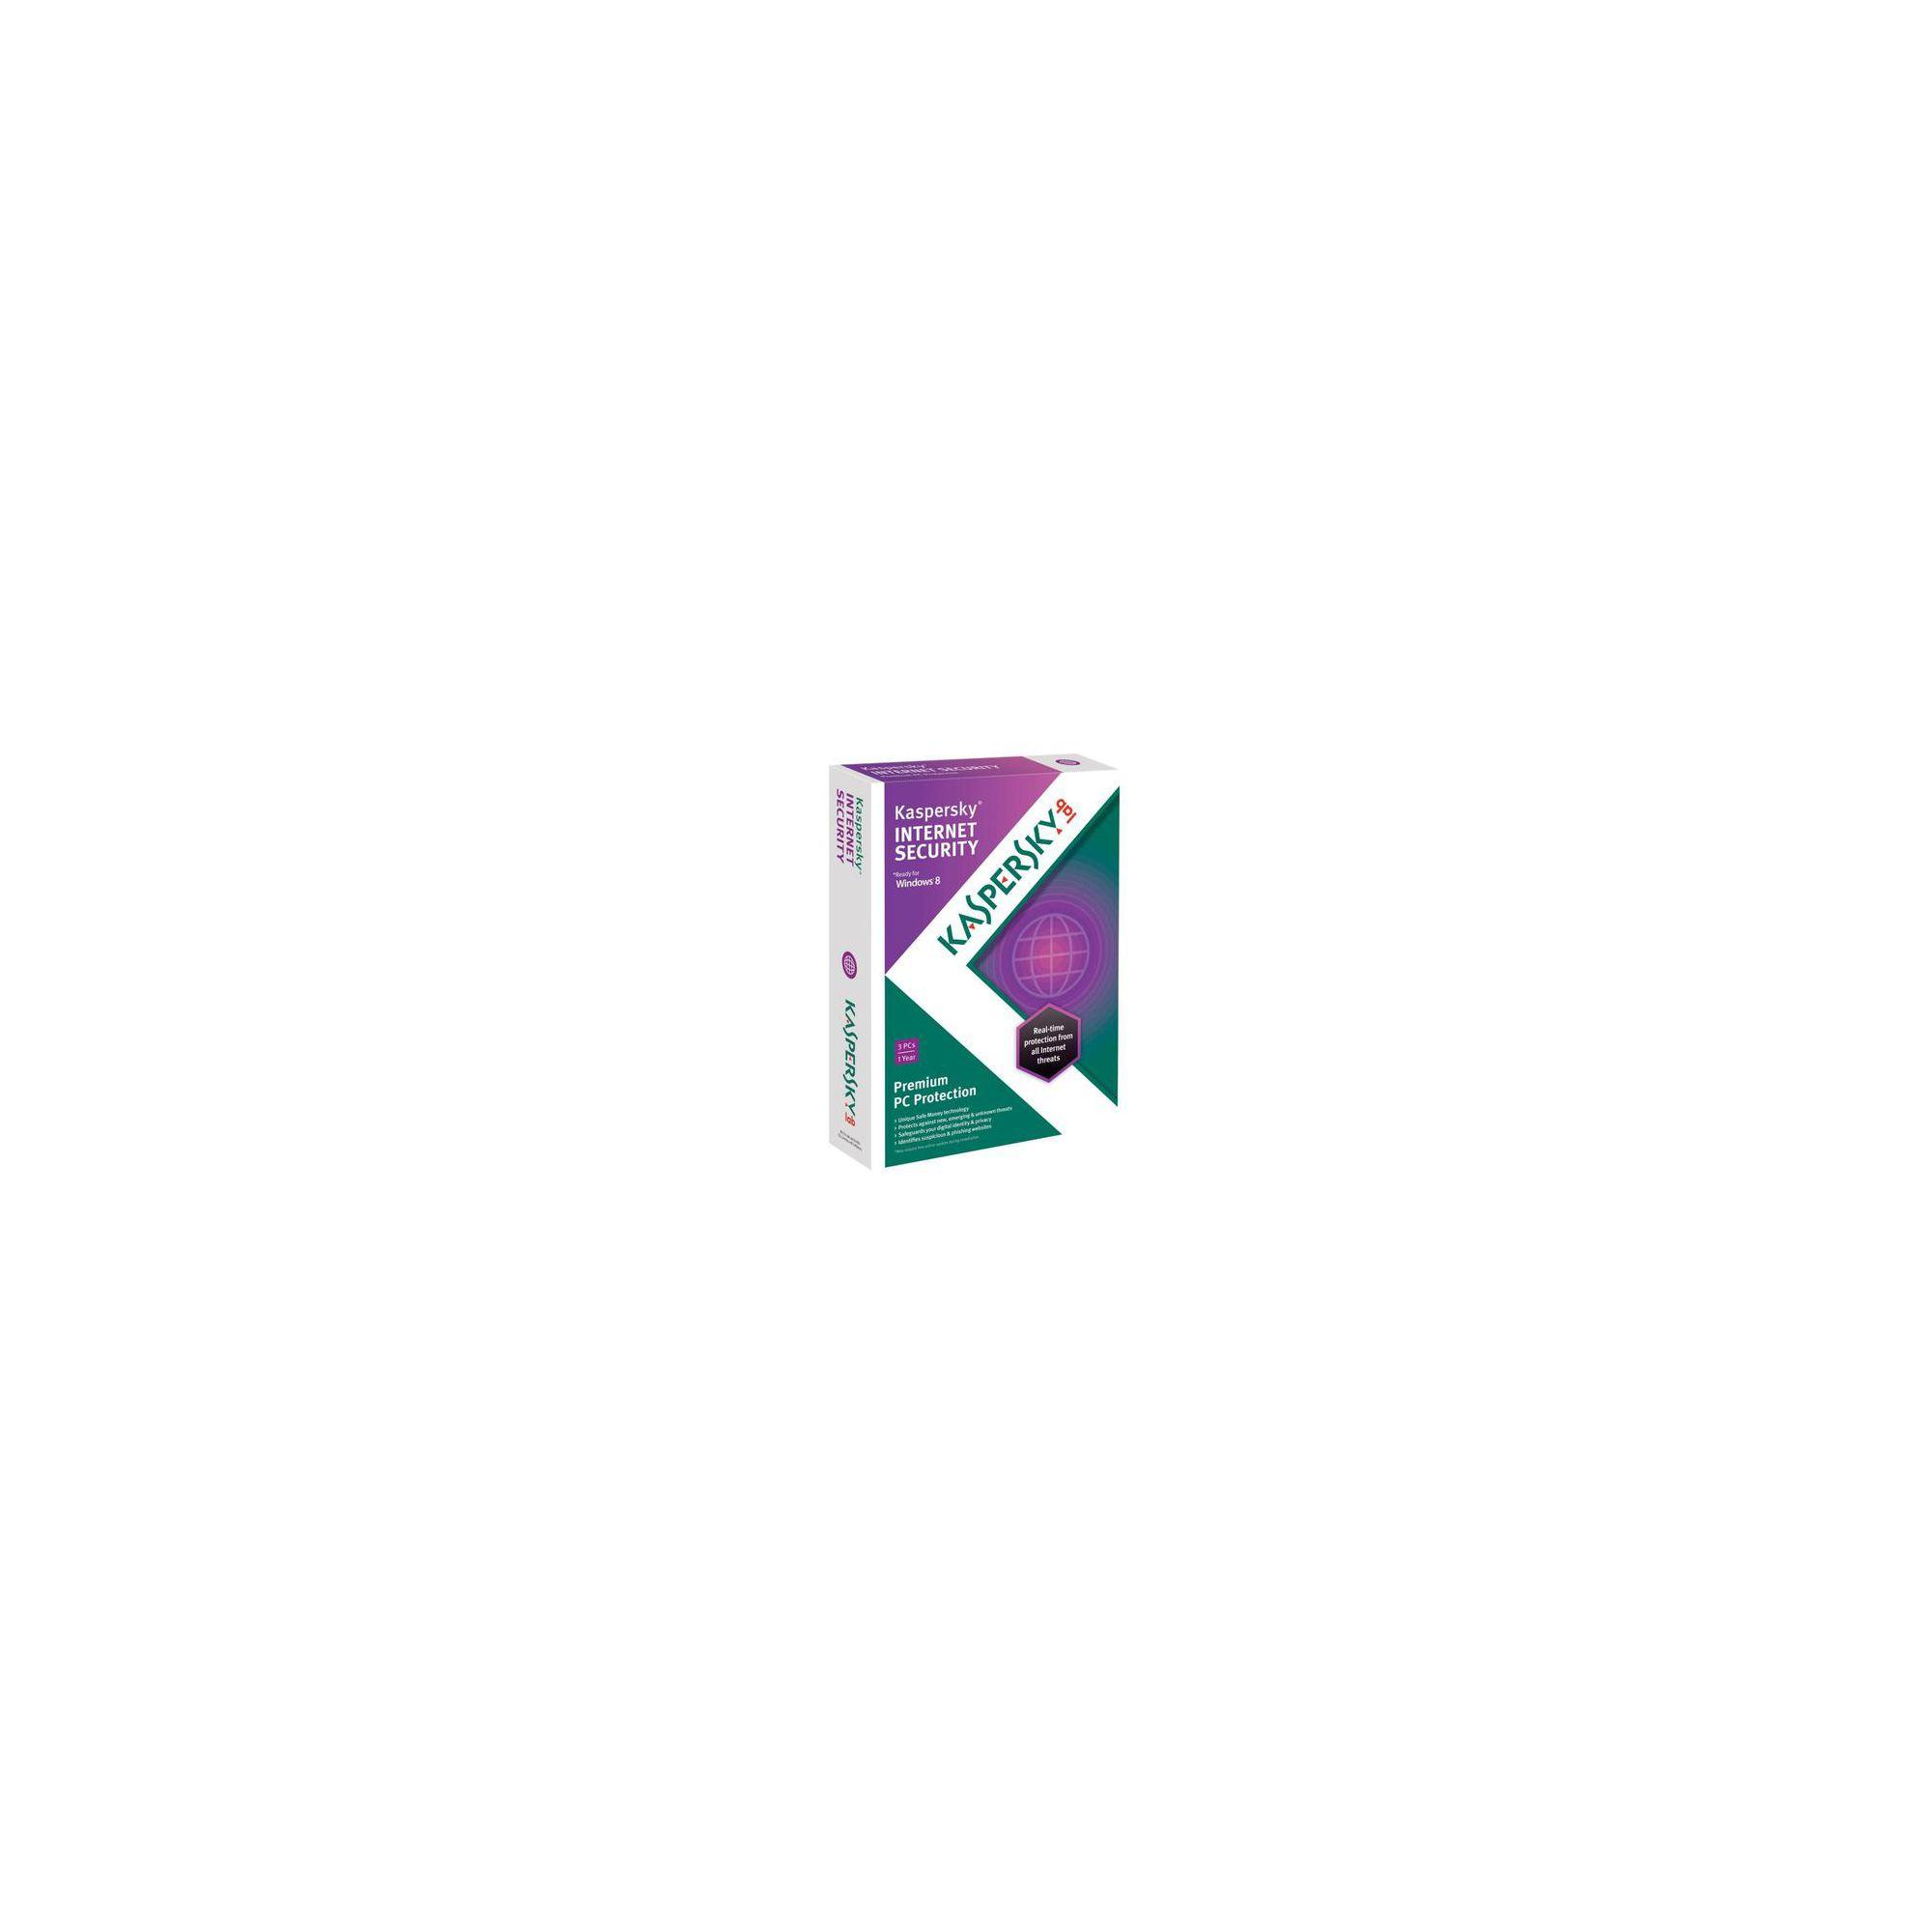 Tavoli mediaworld offerta kaspersky for Miglior software arredamento interni